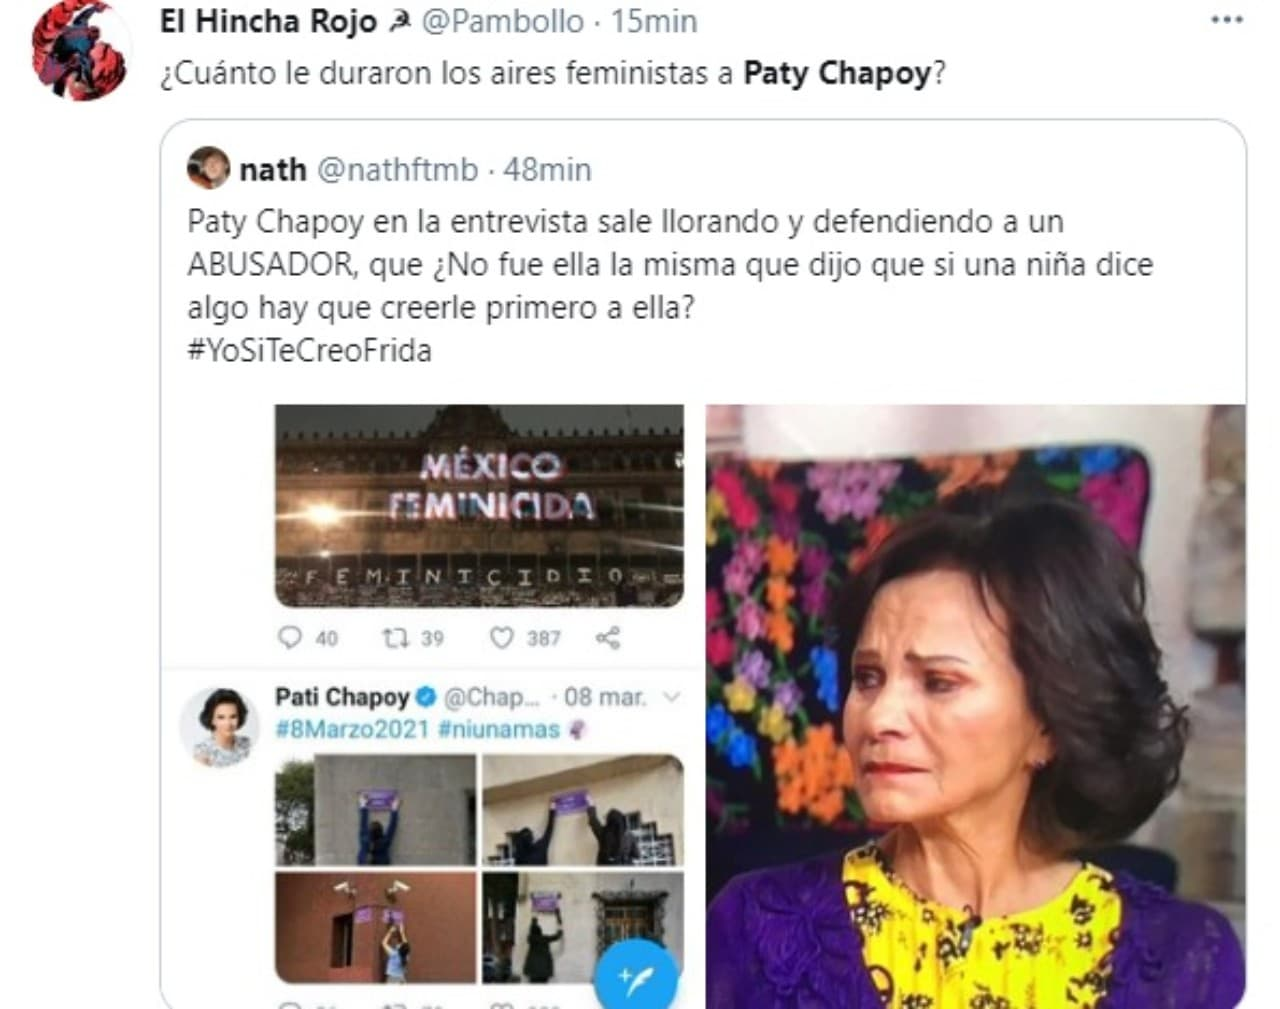 paty Chapoy se dice feminista tweet